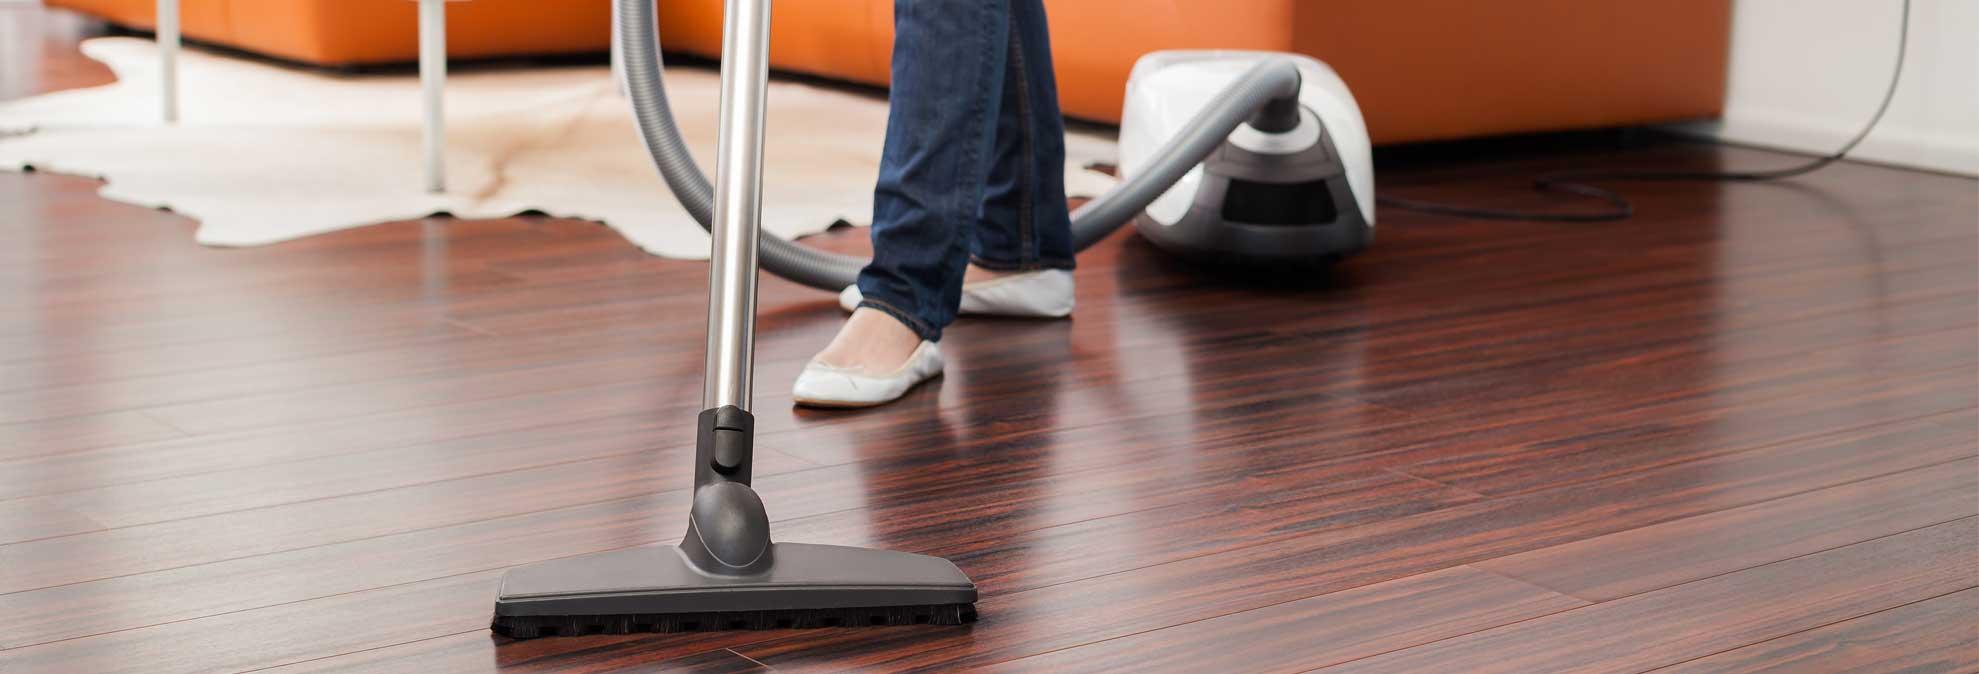 Best Vacuums Of 2016 Consumer Reports